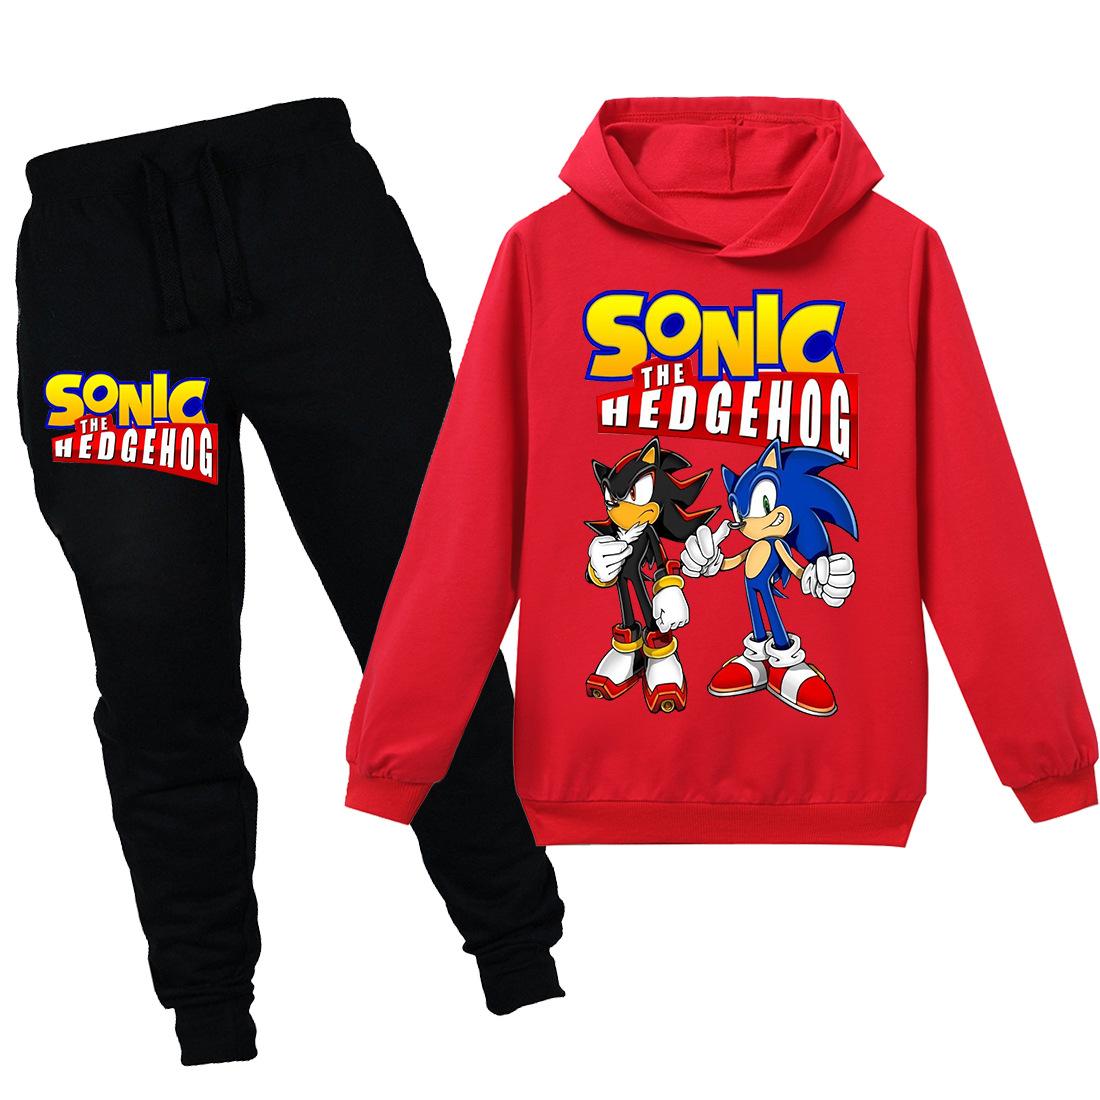 /& Jogger Sweatpant 3-Piece Athleisure Outfit Bundle Set-Boys 4-20 T-Shirt SEGA Sonic The Hedgehog Graphic Hoodie